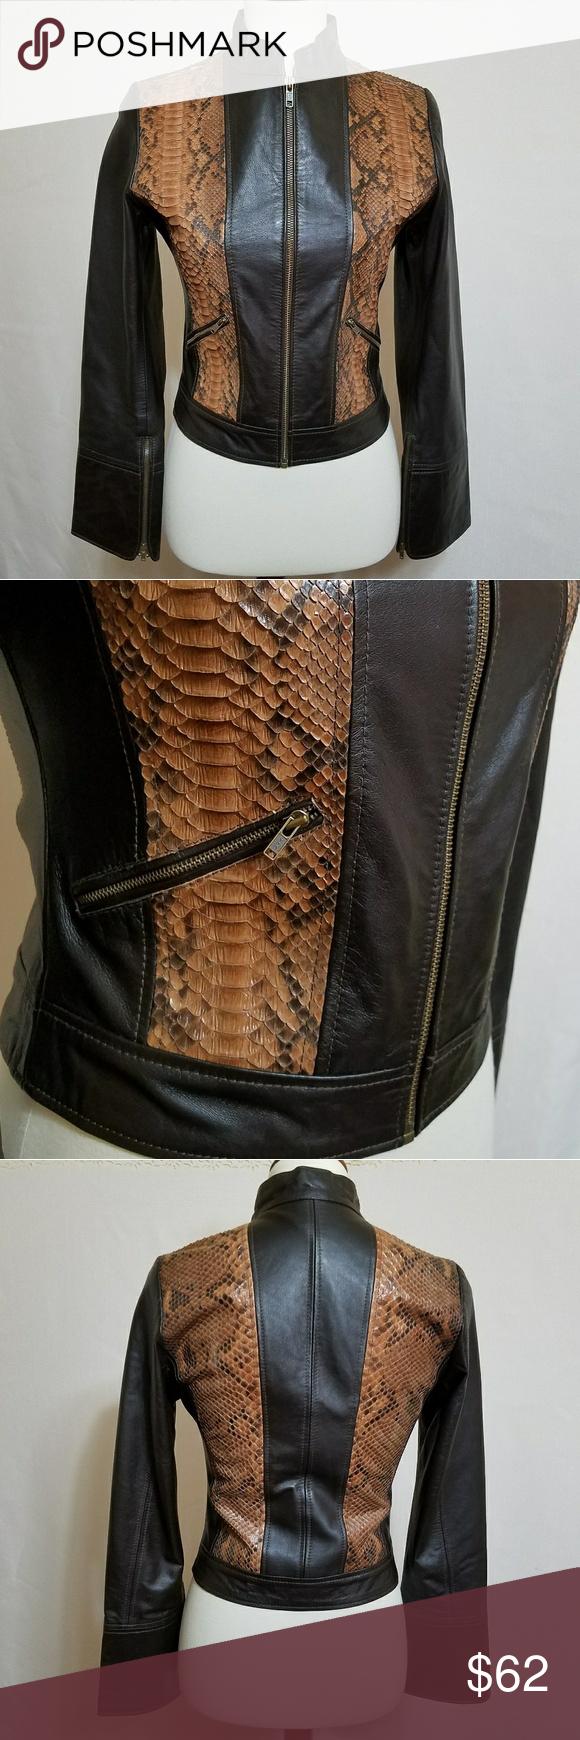 Brown Leather Jacket Python Snakeskin Genuine 4 100